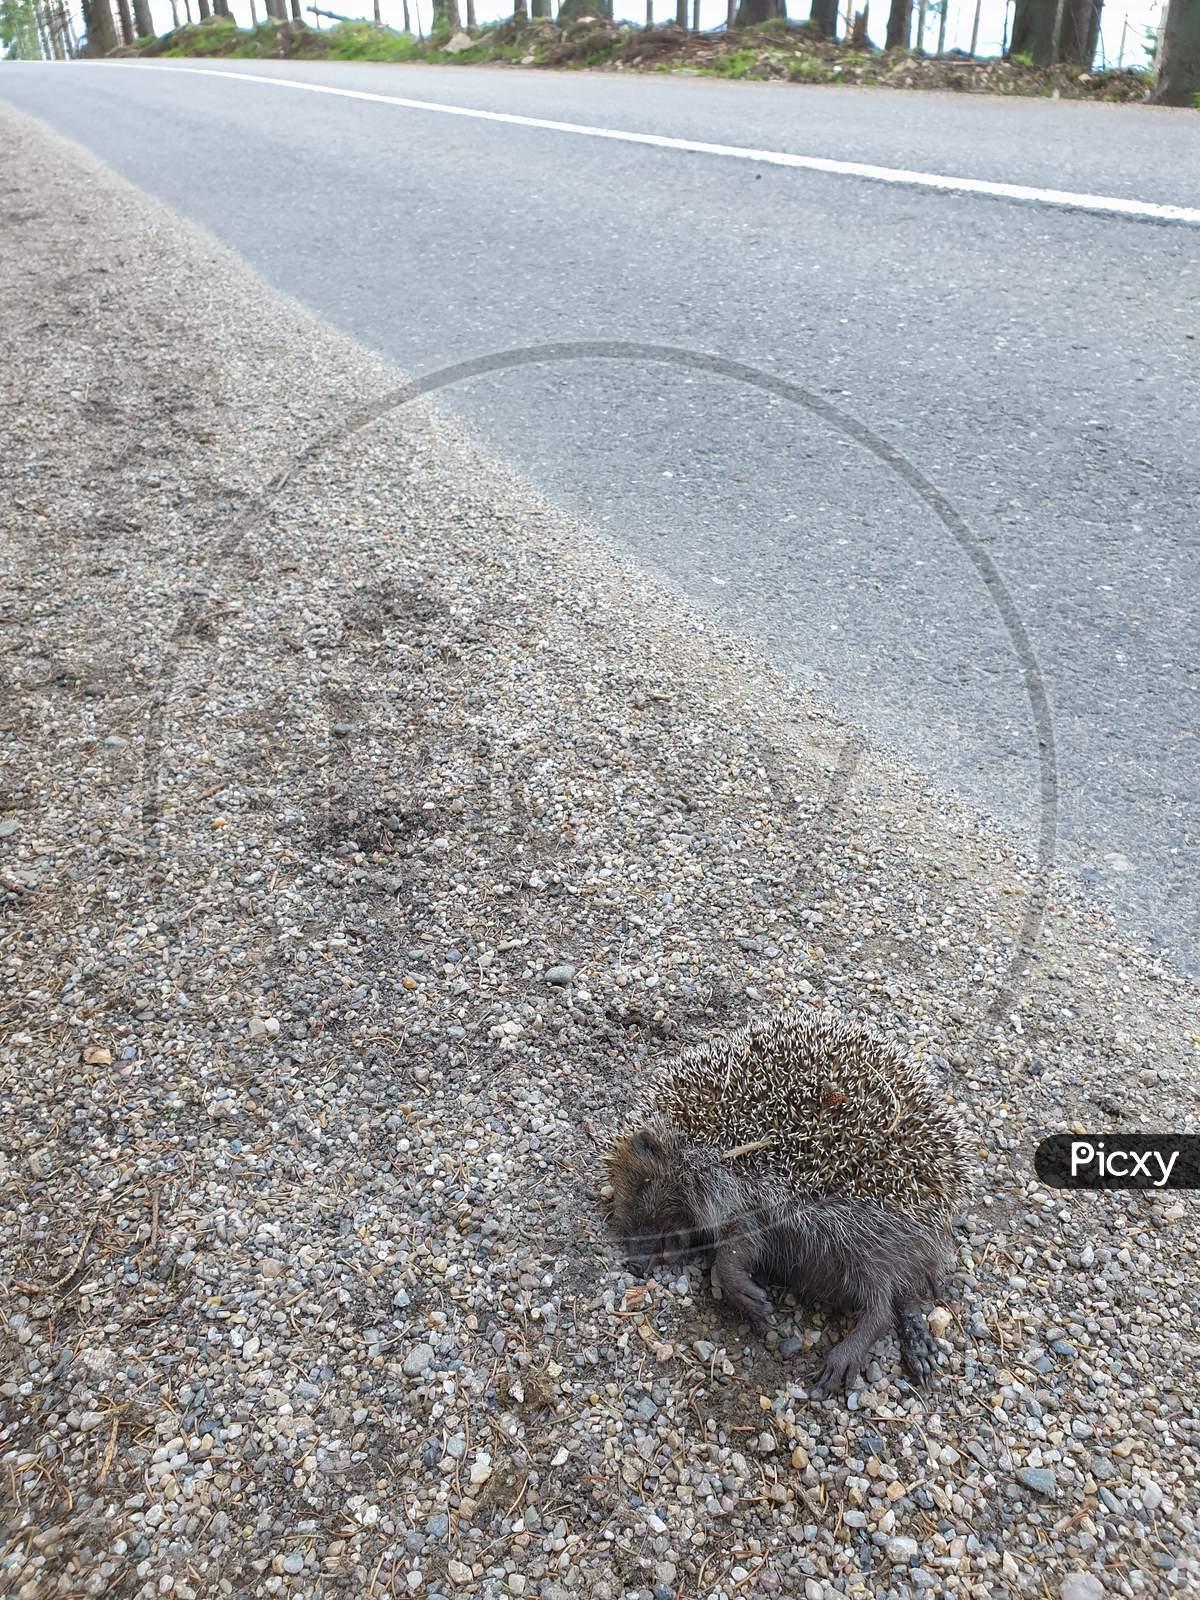 Dead Wildlife Roadkill Hit By Car On Side Of Road